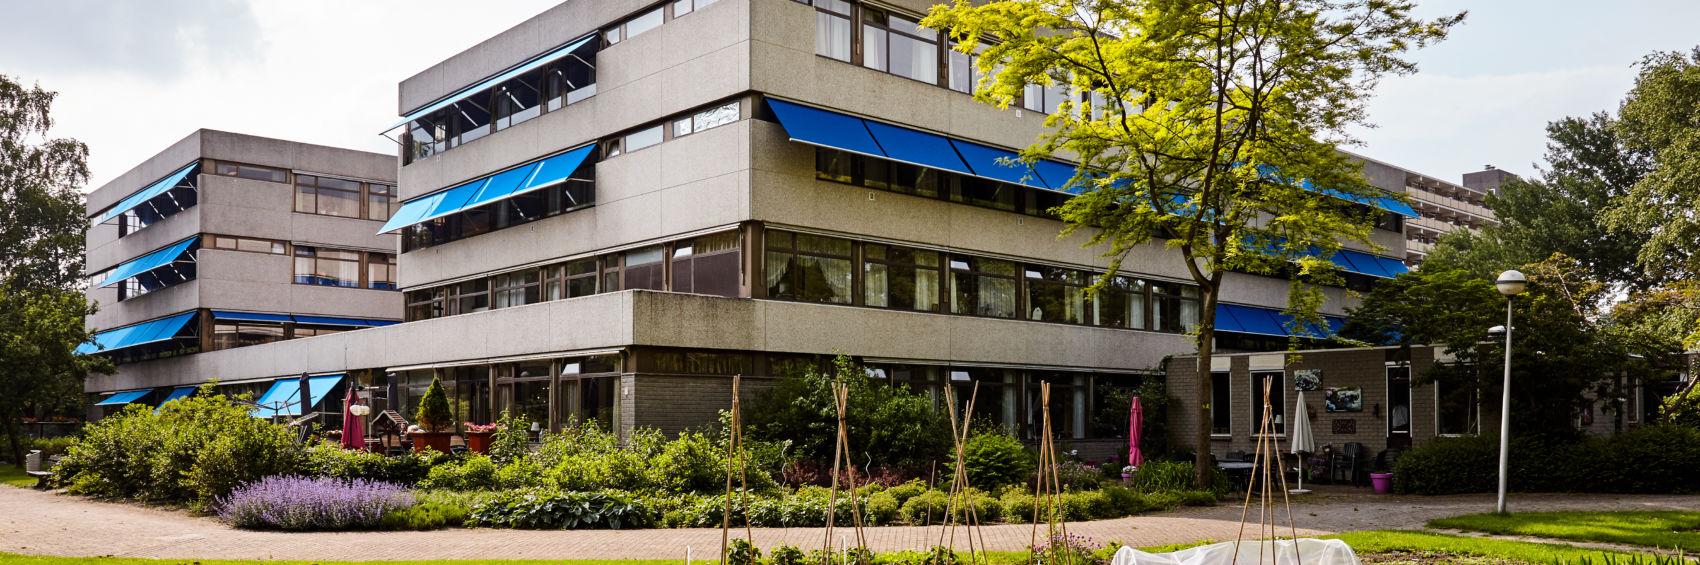 Blauwbörgje verpleeghuis